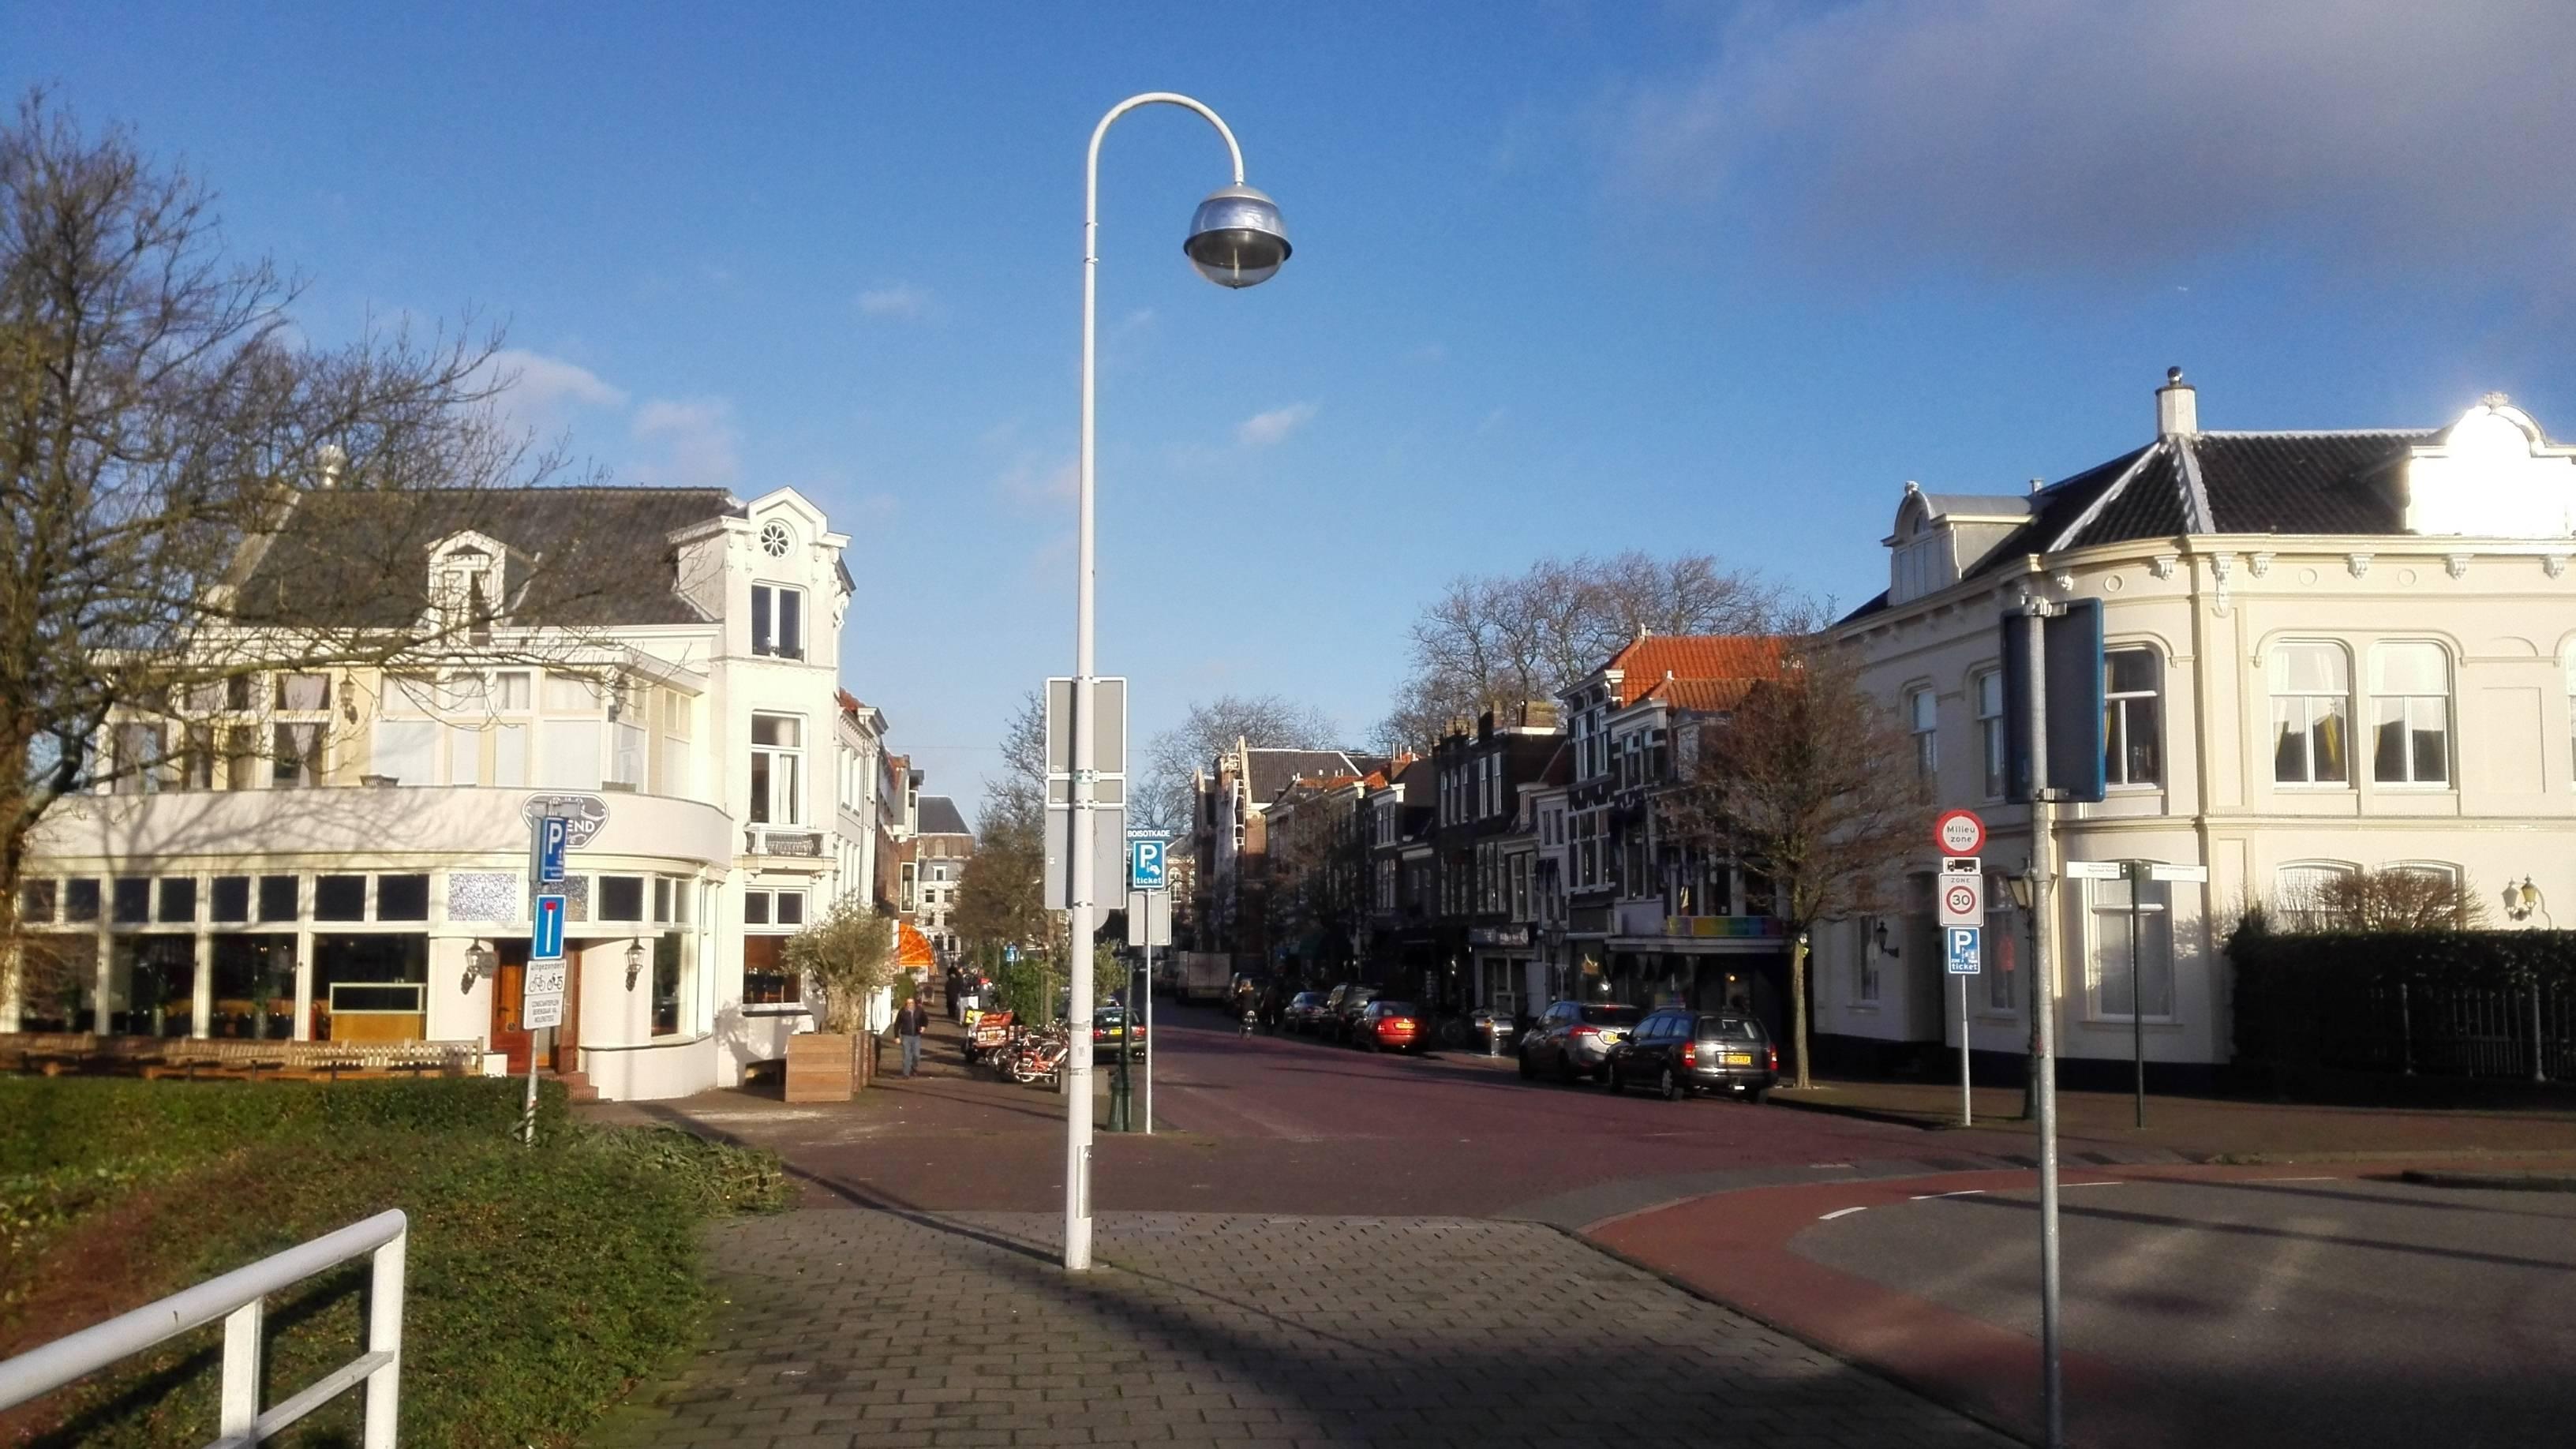 https://public.parariusoffice.nl/216/photos/huge/2546010.1452439541-435.jpg